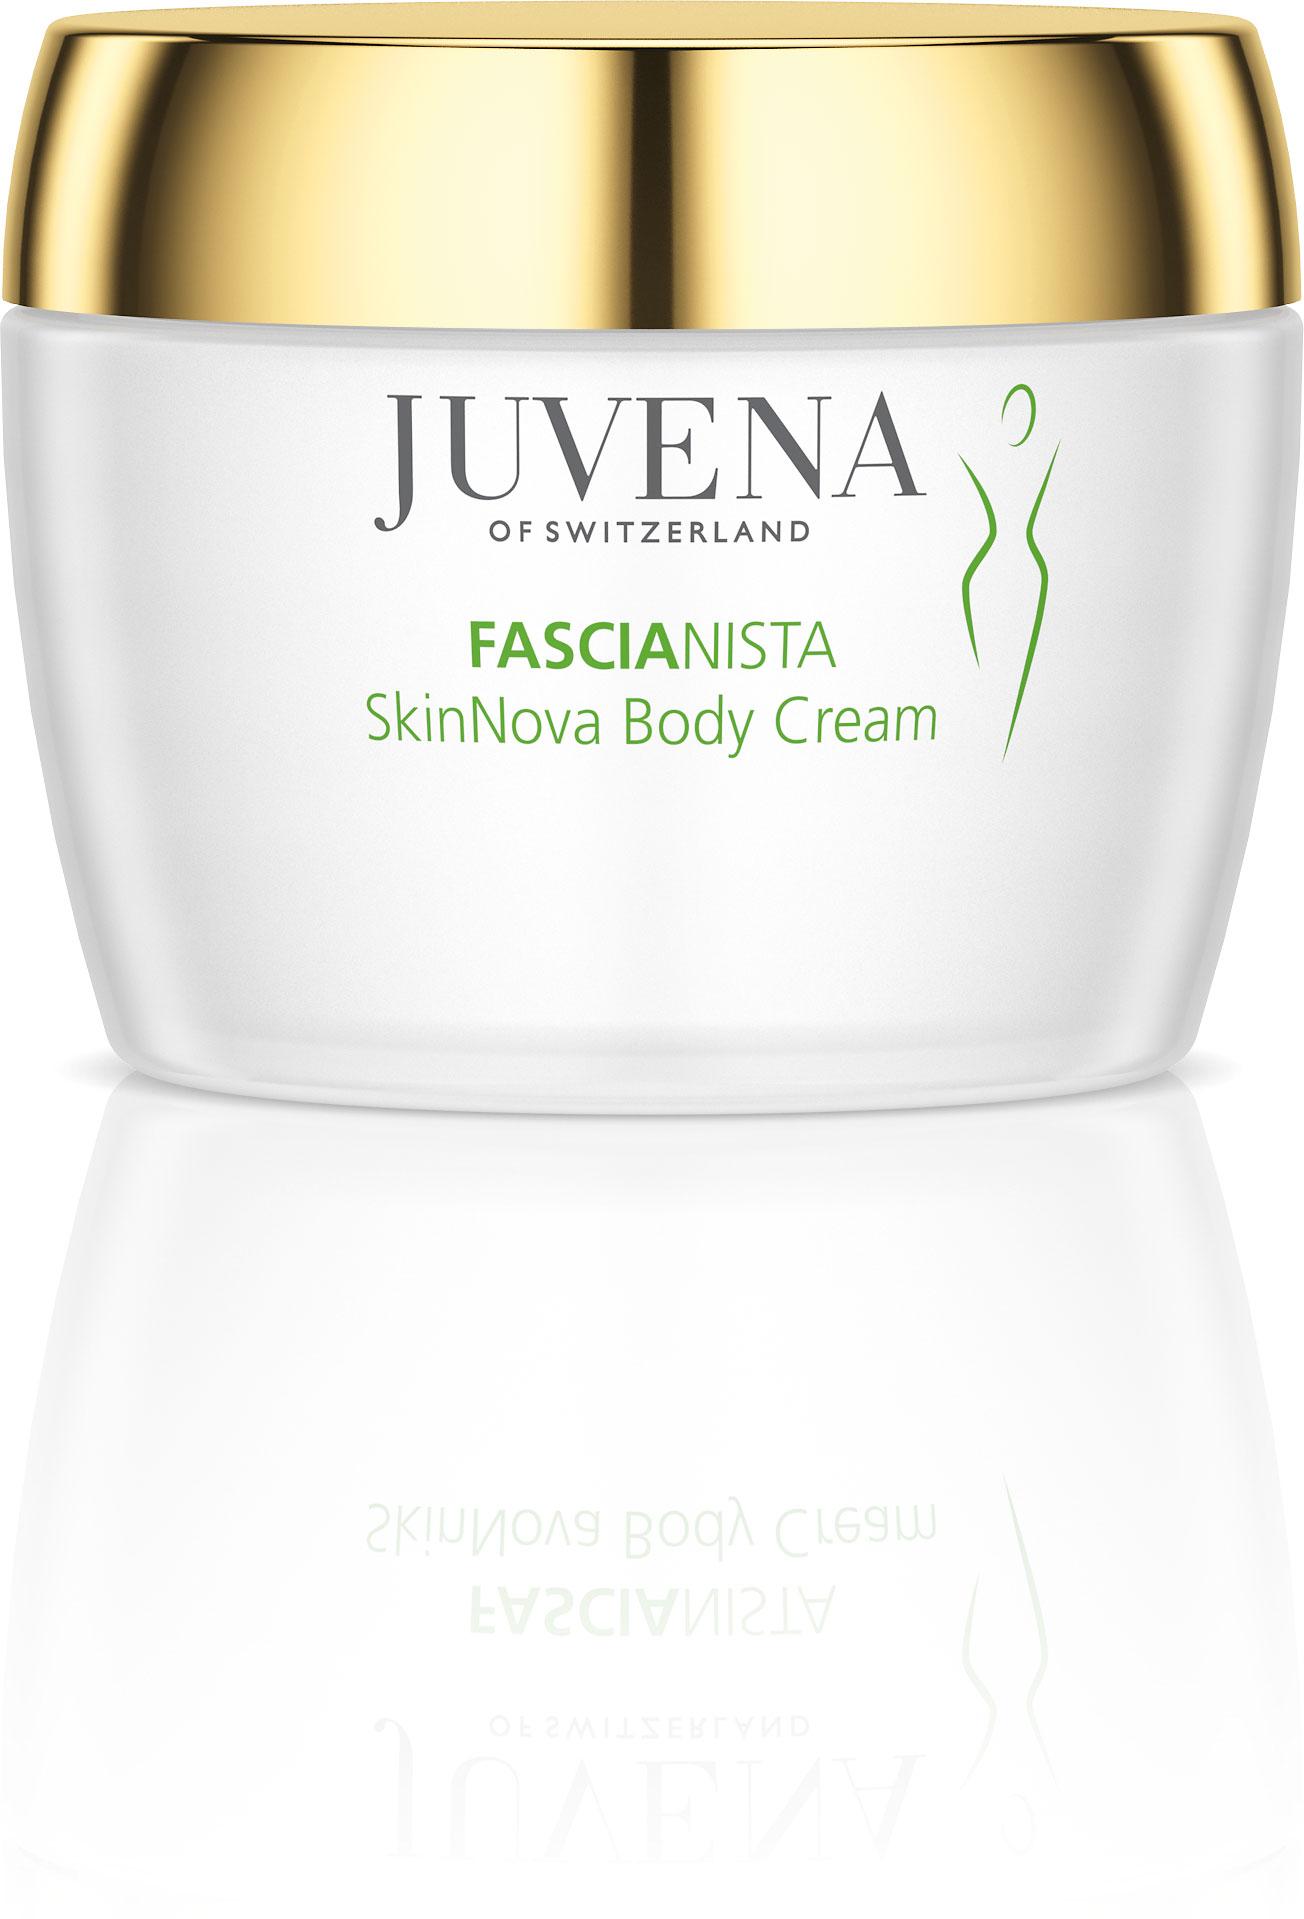 Juvena Fasciantista SkinNova Body Cream 200 ml